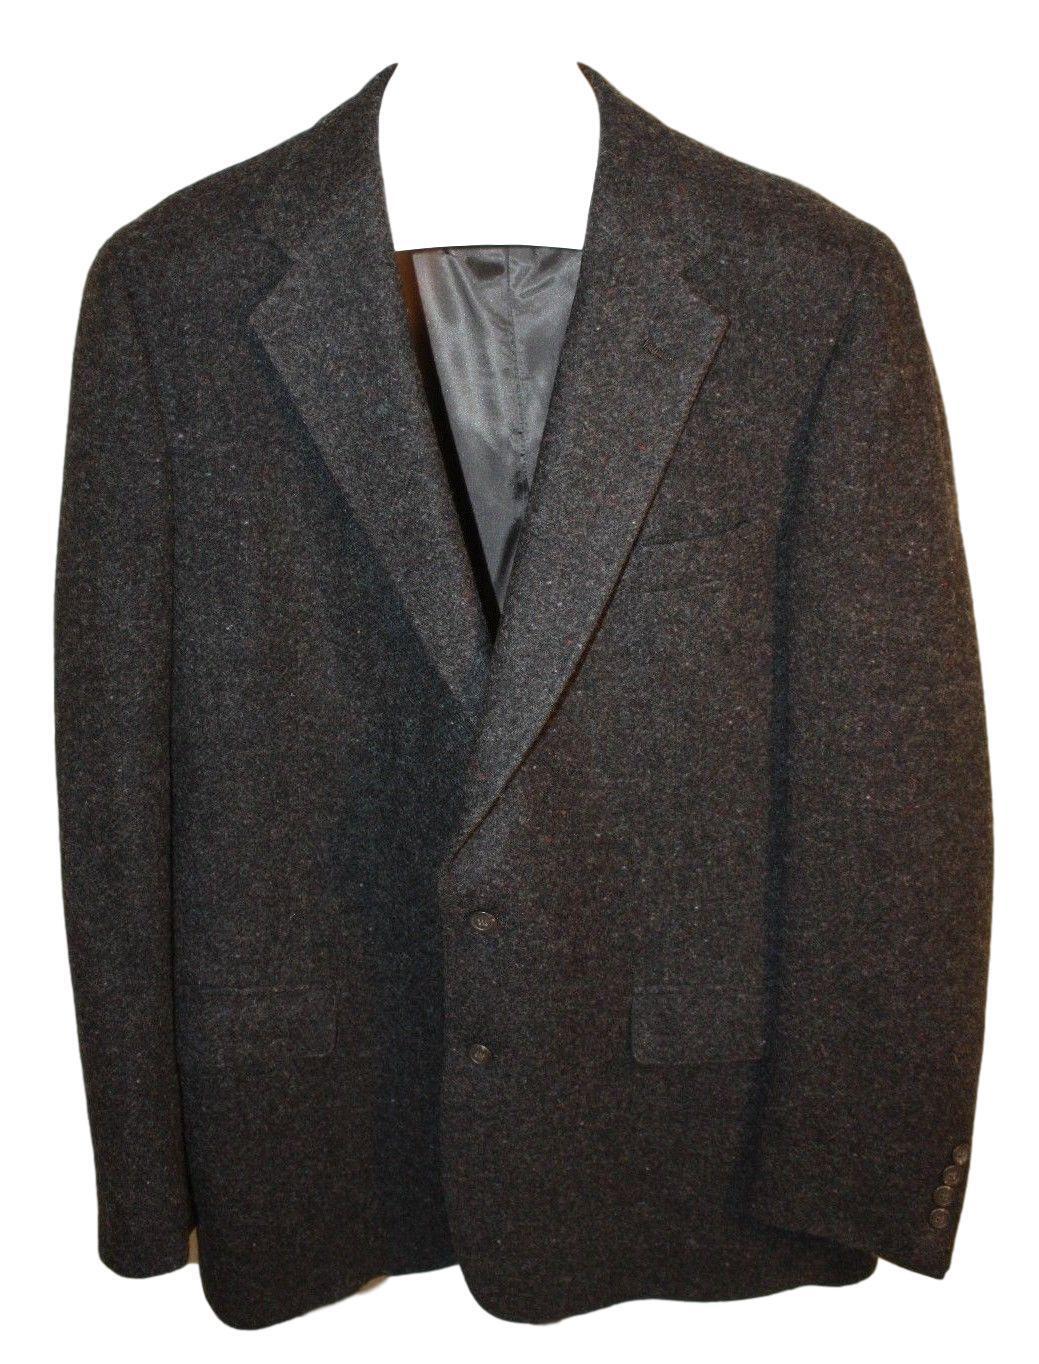 Polo University Club Ralph Lauren Mens Wool Charcoal Sport   Coat Blazer Size 44